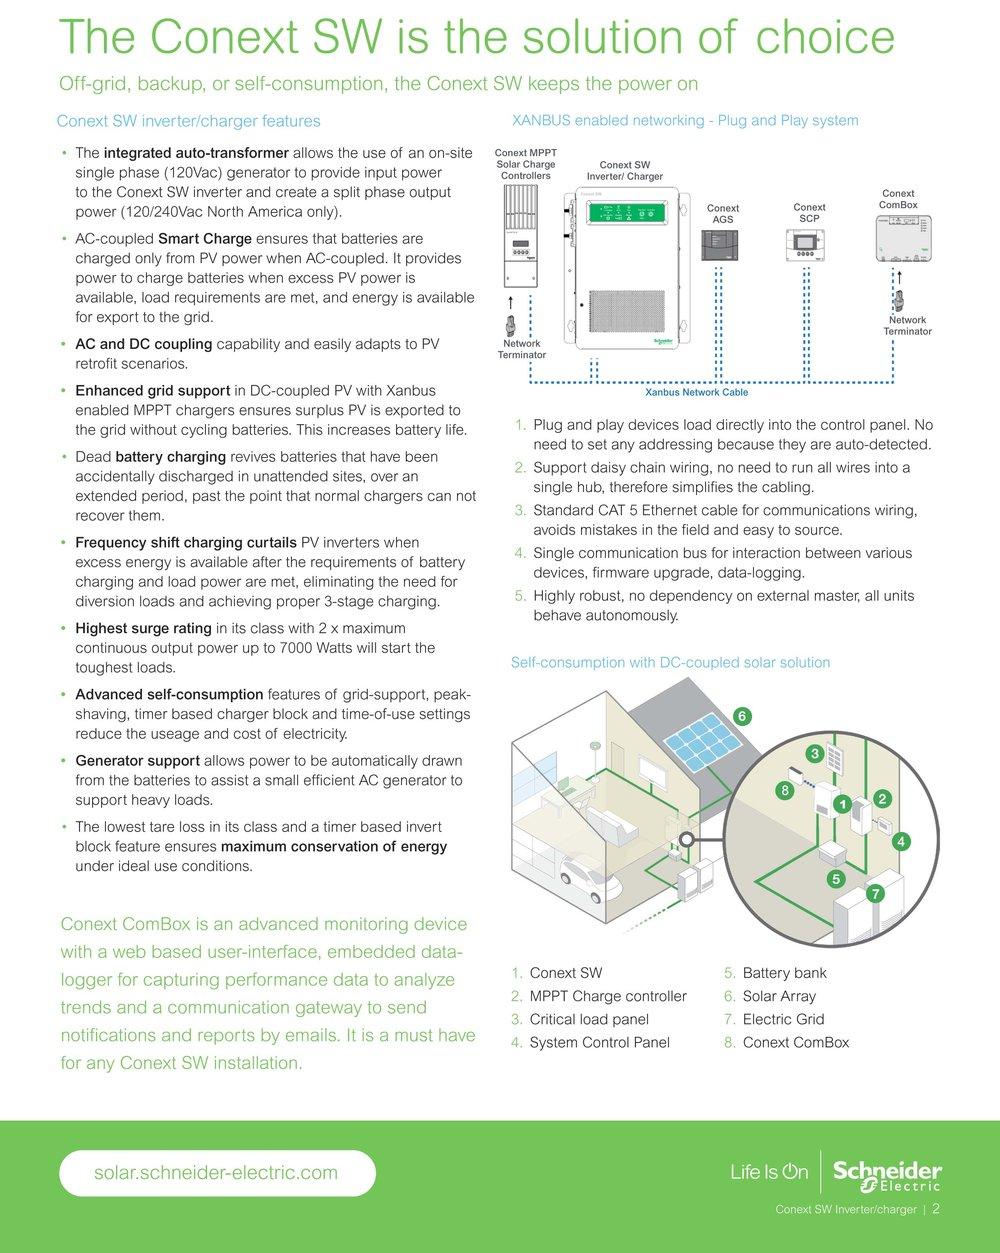 conext-sw-brochure-20160620-2.jpg